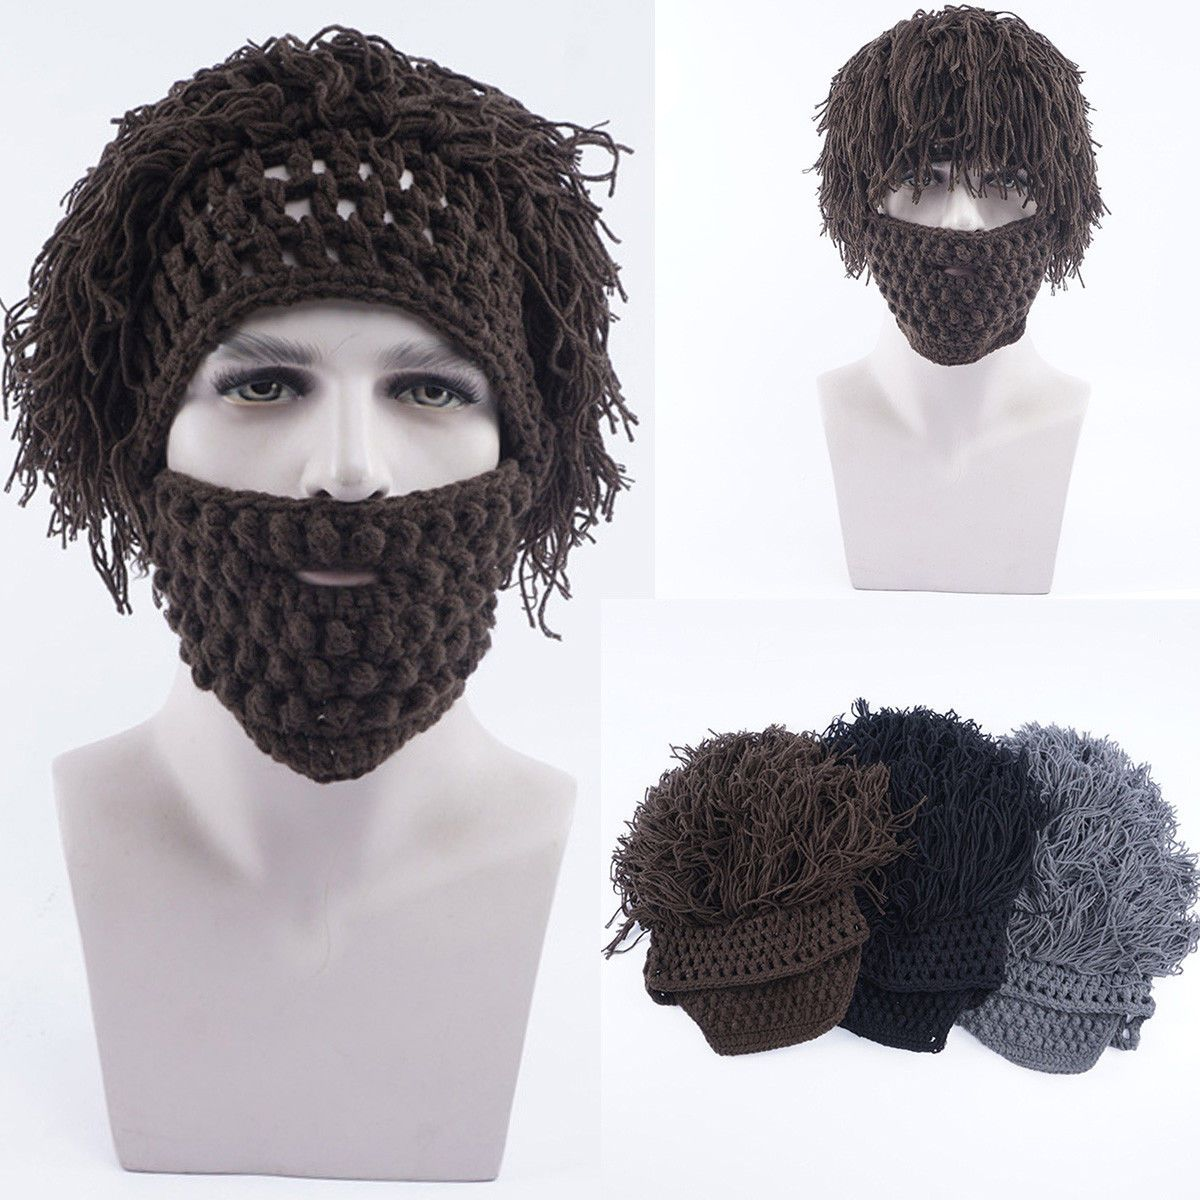 d56f554a16c Mens Boys Funny Wig Beard Hats Hobo Mad Caveman Winter Knit Warm Hat  Beanies Cap